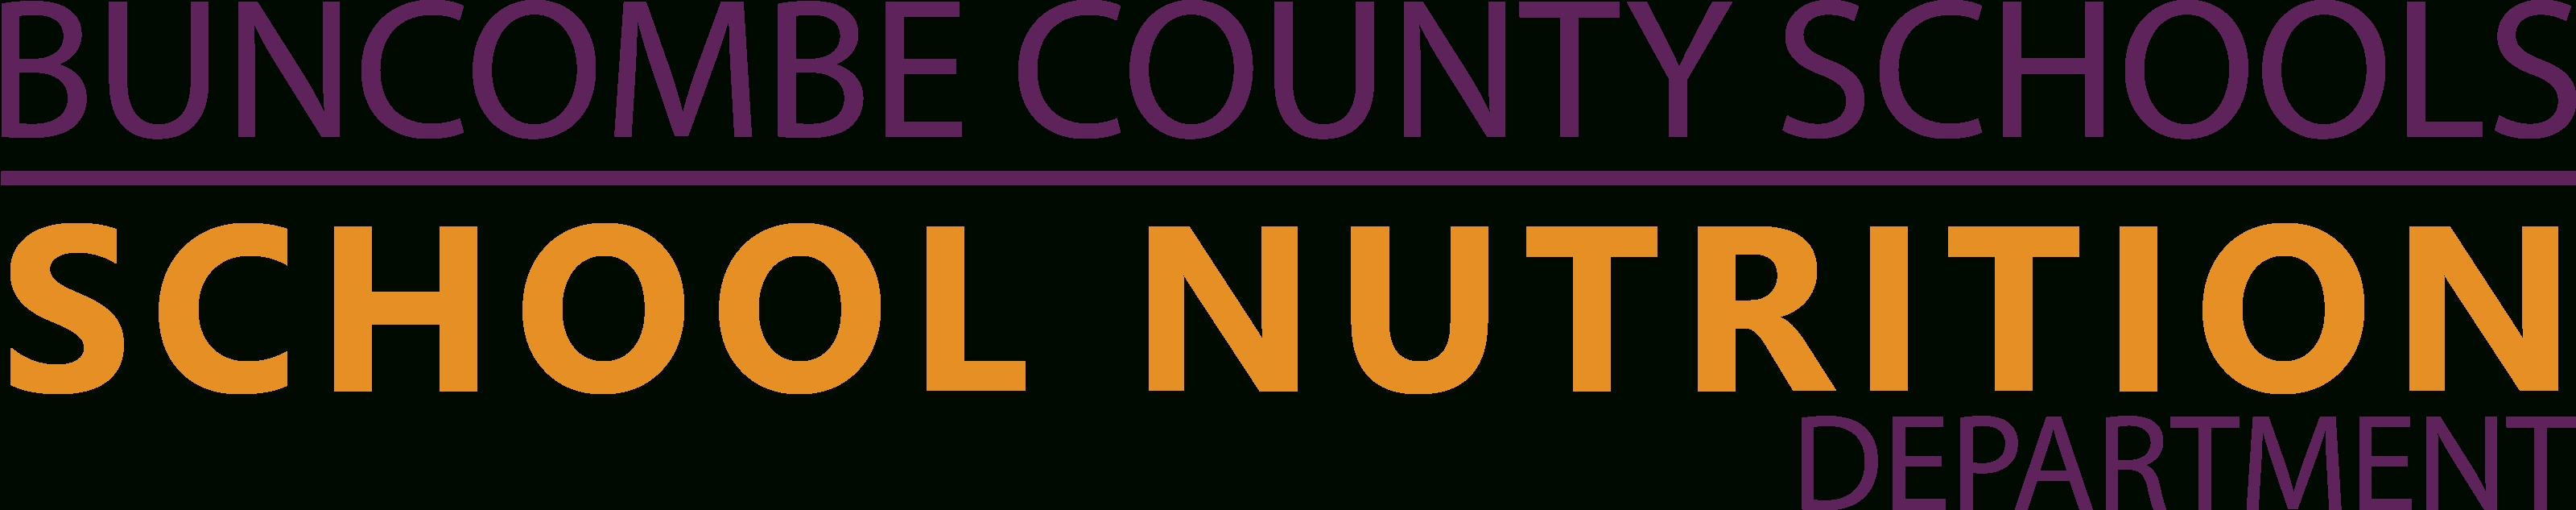 Mission & Vision - Buncombe County Schools Impressive School Calendar Buncombe County